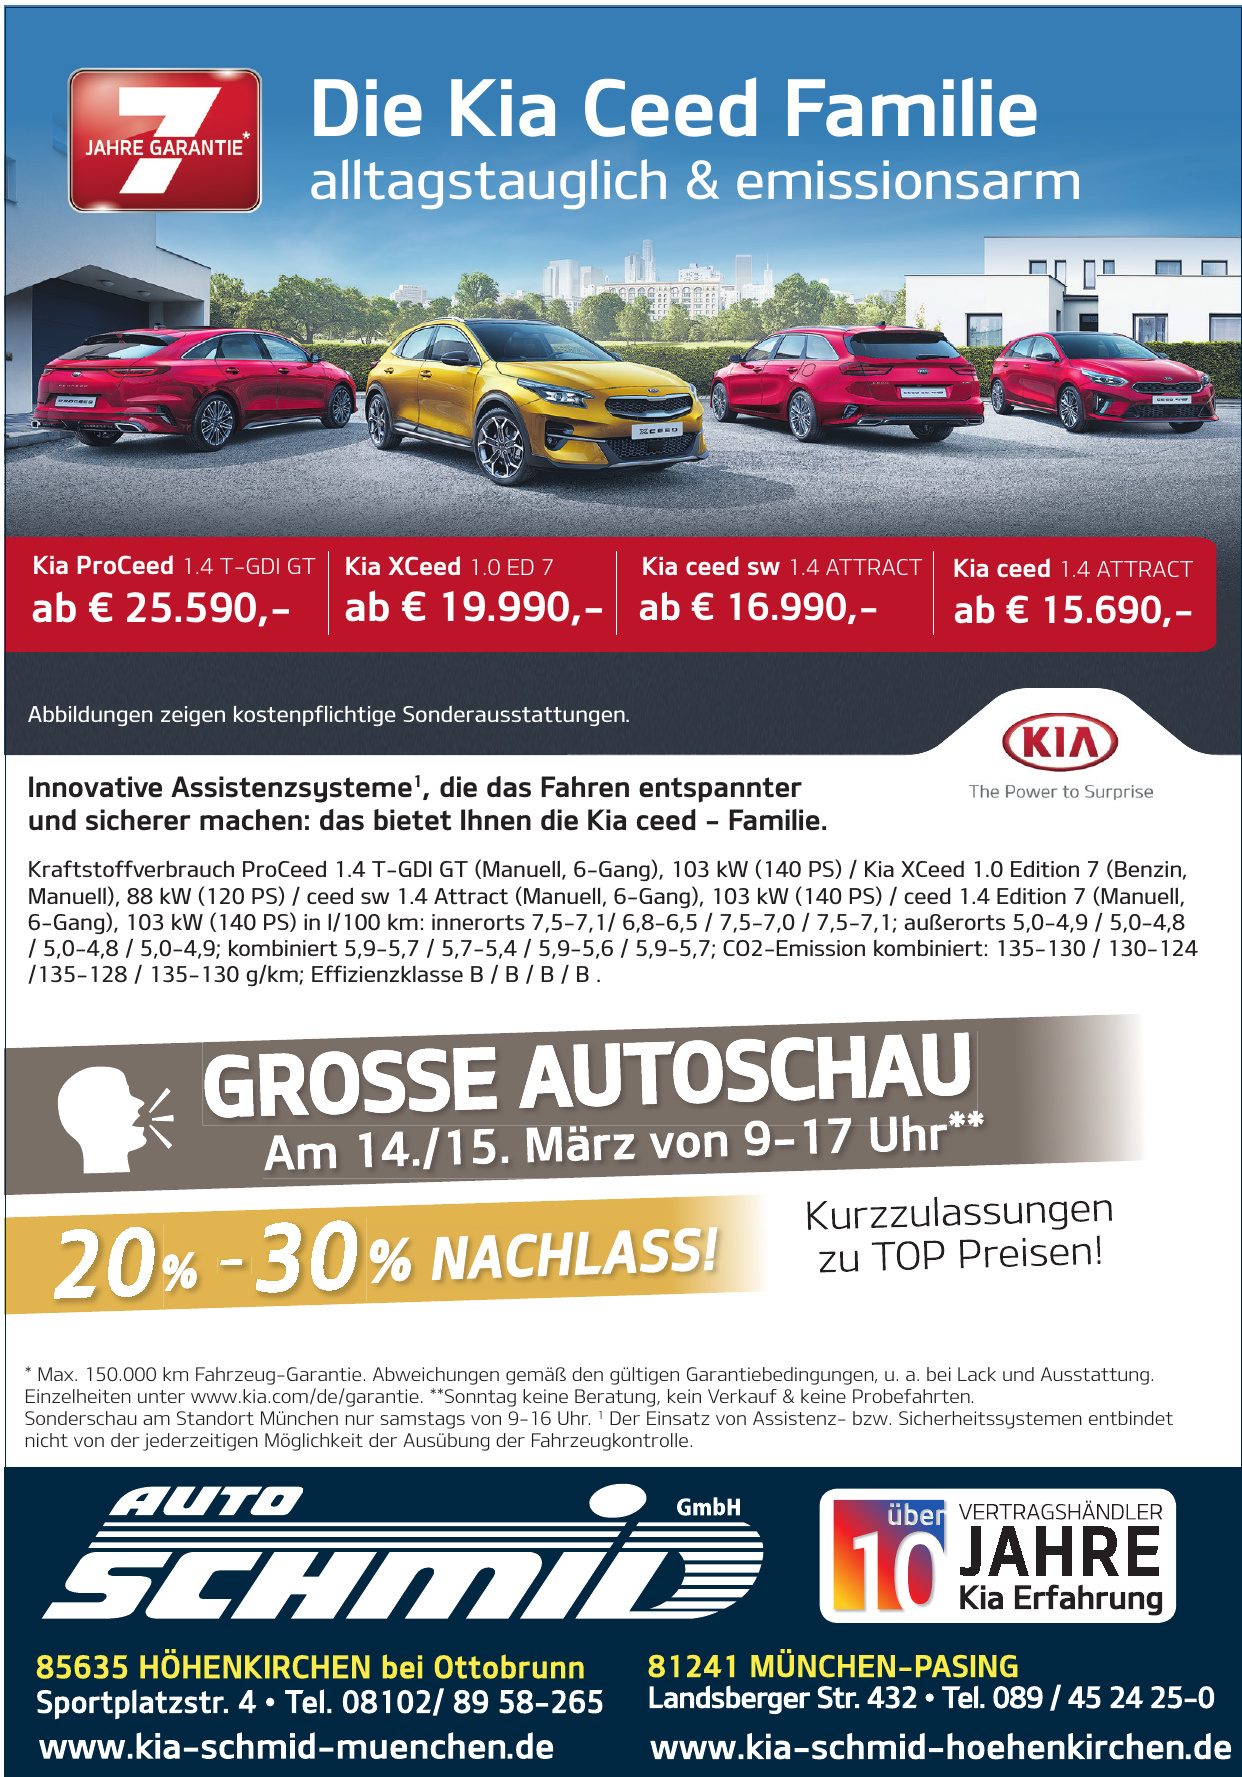 <br><b> Auto Schmid GmbH </b> <p></p> Sportplatzstr. 4 <p></p> 85635 Höhenkirchen bei Ottobrunn <p></p> Tel. 08102/8958 - 265 <p></p><a href='https://kia-schmid-muenchen.de>kia-schmid-muenchen.de'</a> </p> <hr> <br><b> Auto Schmid GmbH </b> <p></p> Landsberger Str. 432 <p></p> 81241 München-Pasing <p></p> Tel. 089/45 24 25 - 0 <p></p><a href='https://kia-schmid-muenchen.de>kia-schmid-muenchen.de'</a>